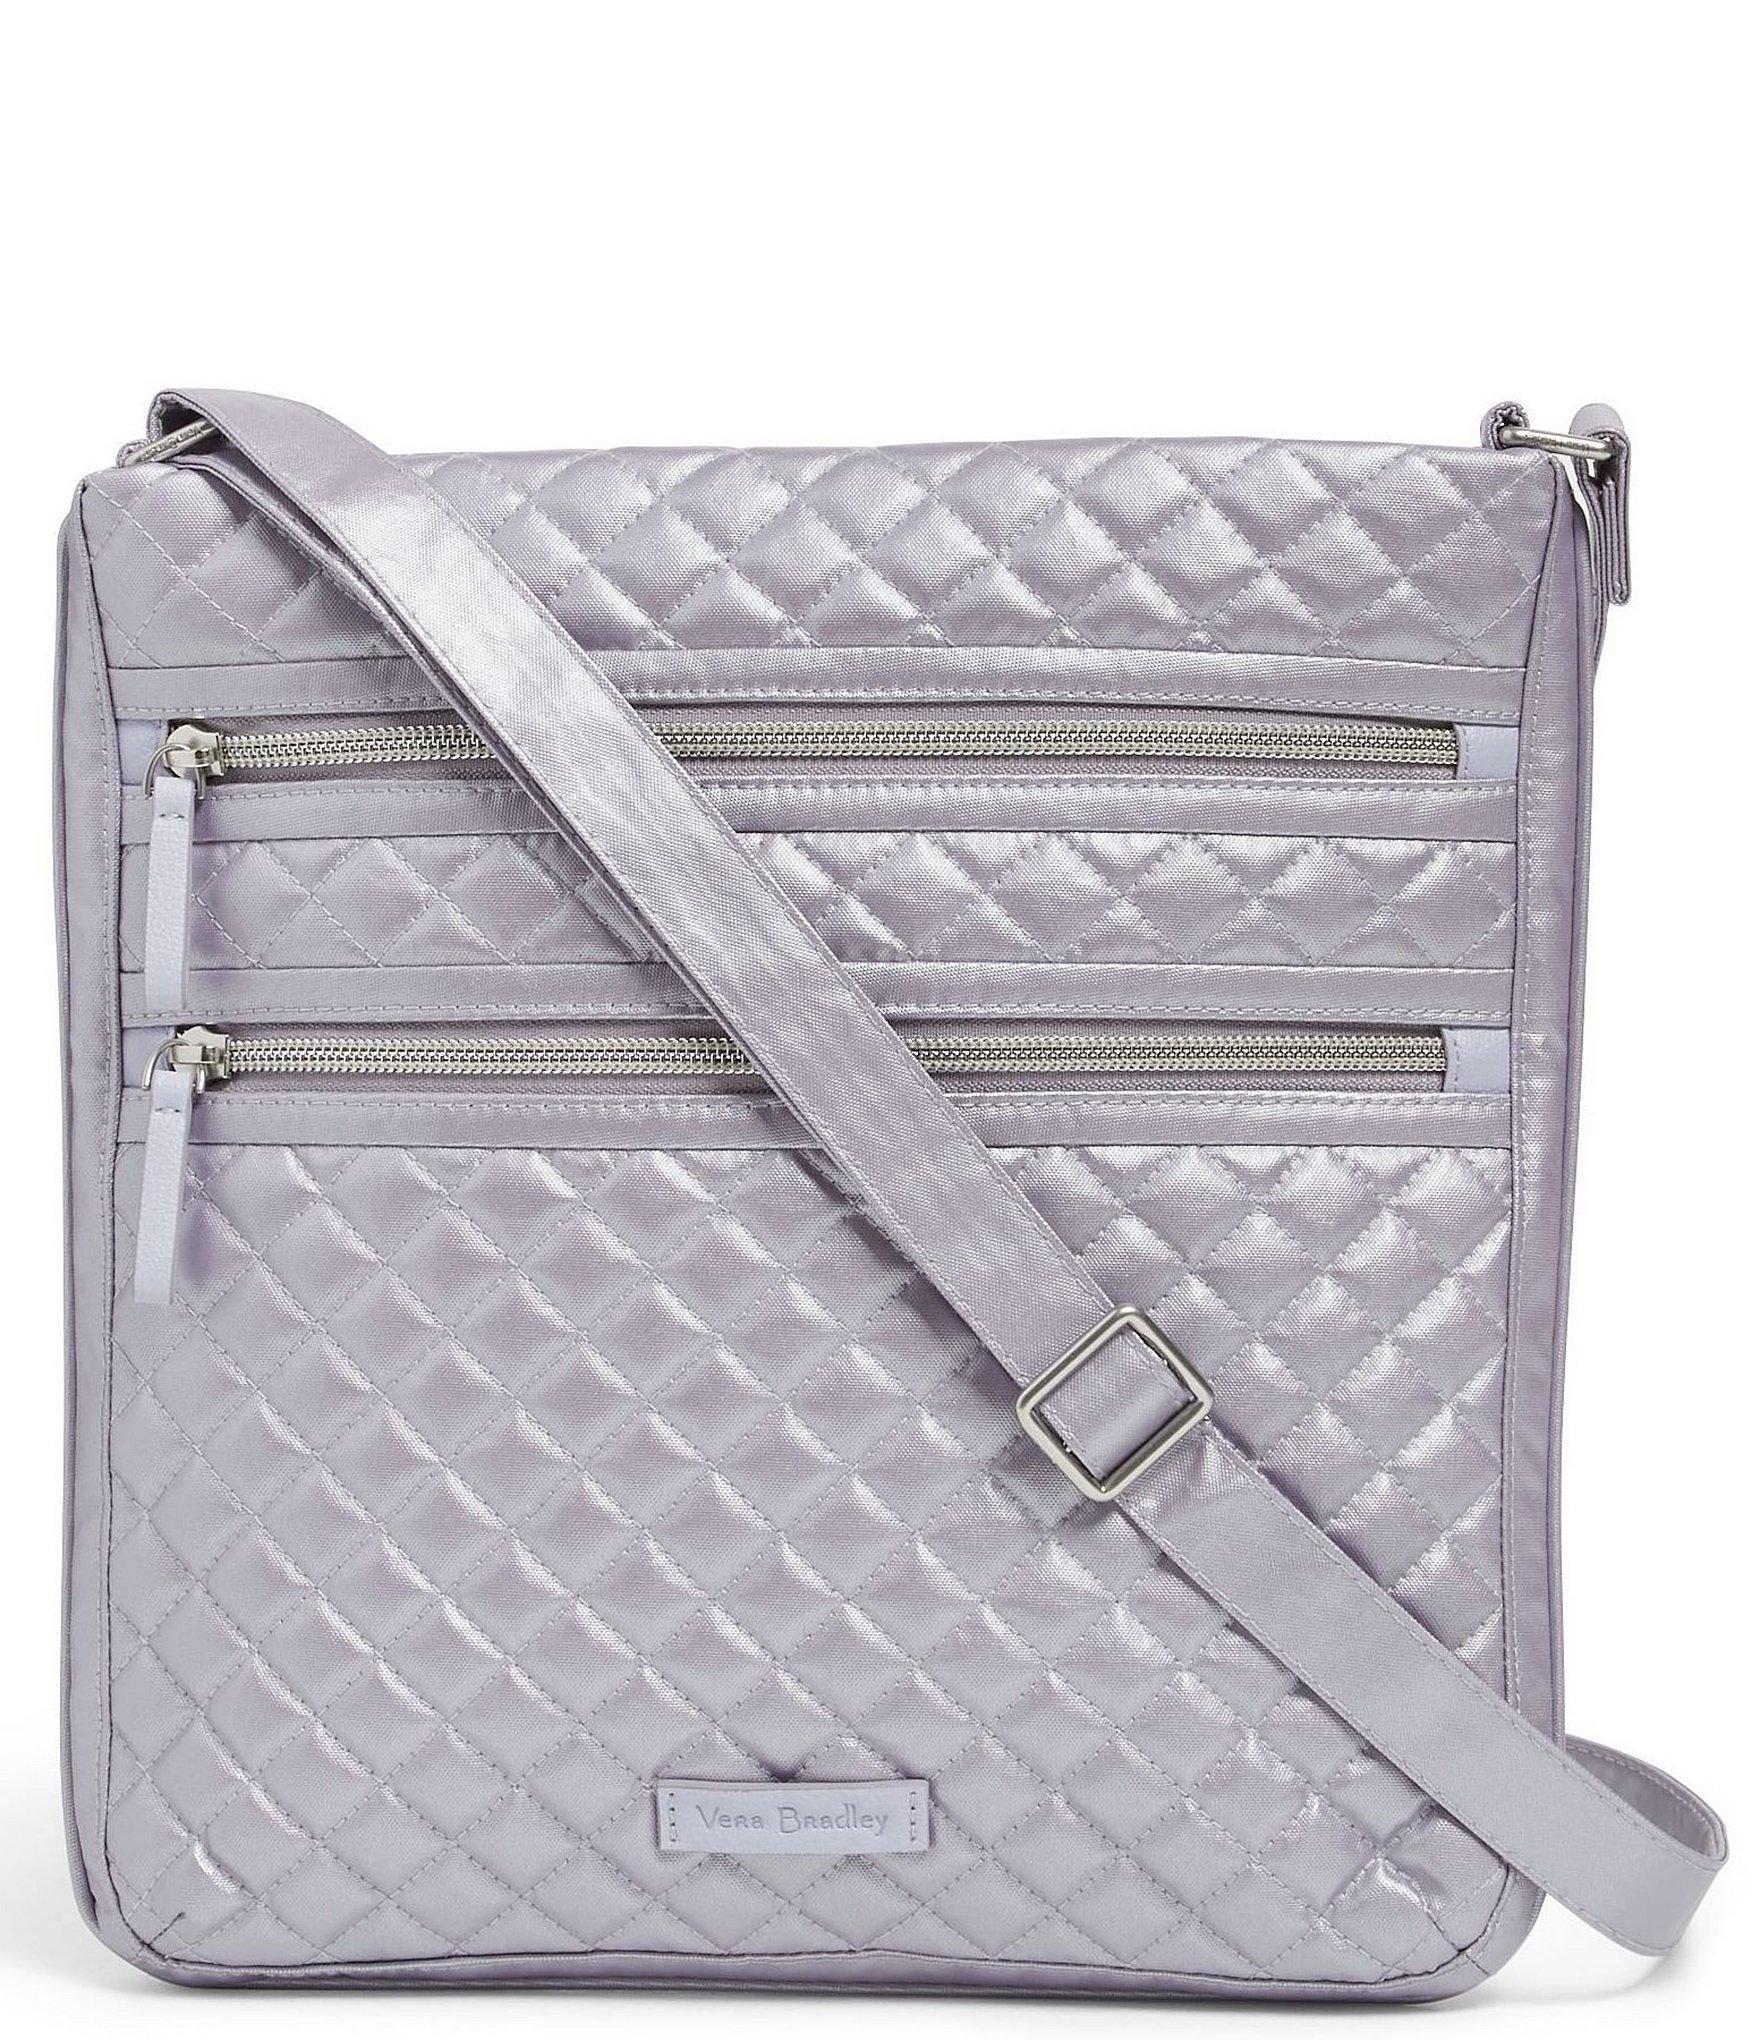 829bbfe5bb5 Vera Bradley - Multicolor Iconic Triple Zip Hipster Cross-body Bag - Lyst.  View fullscreen